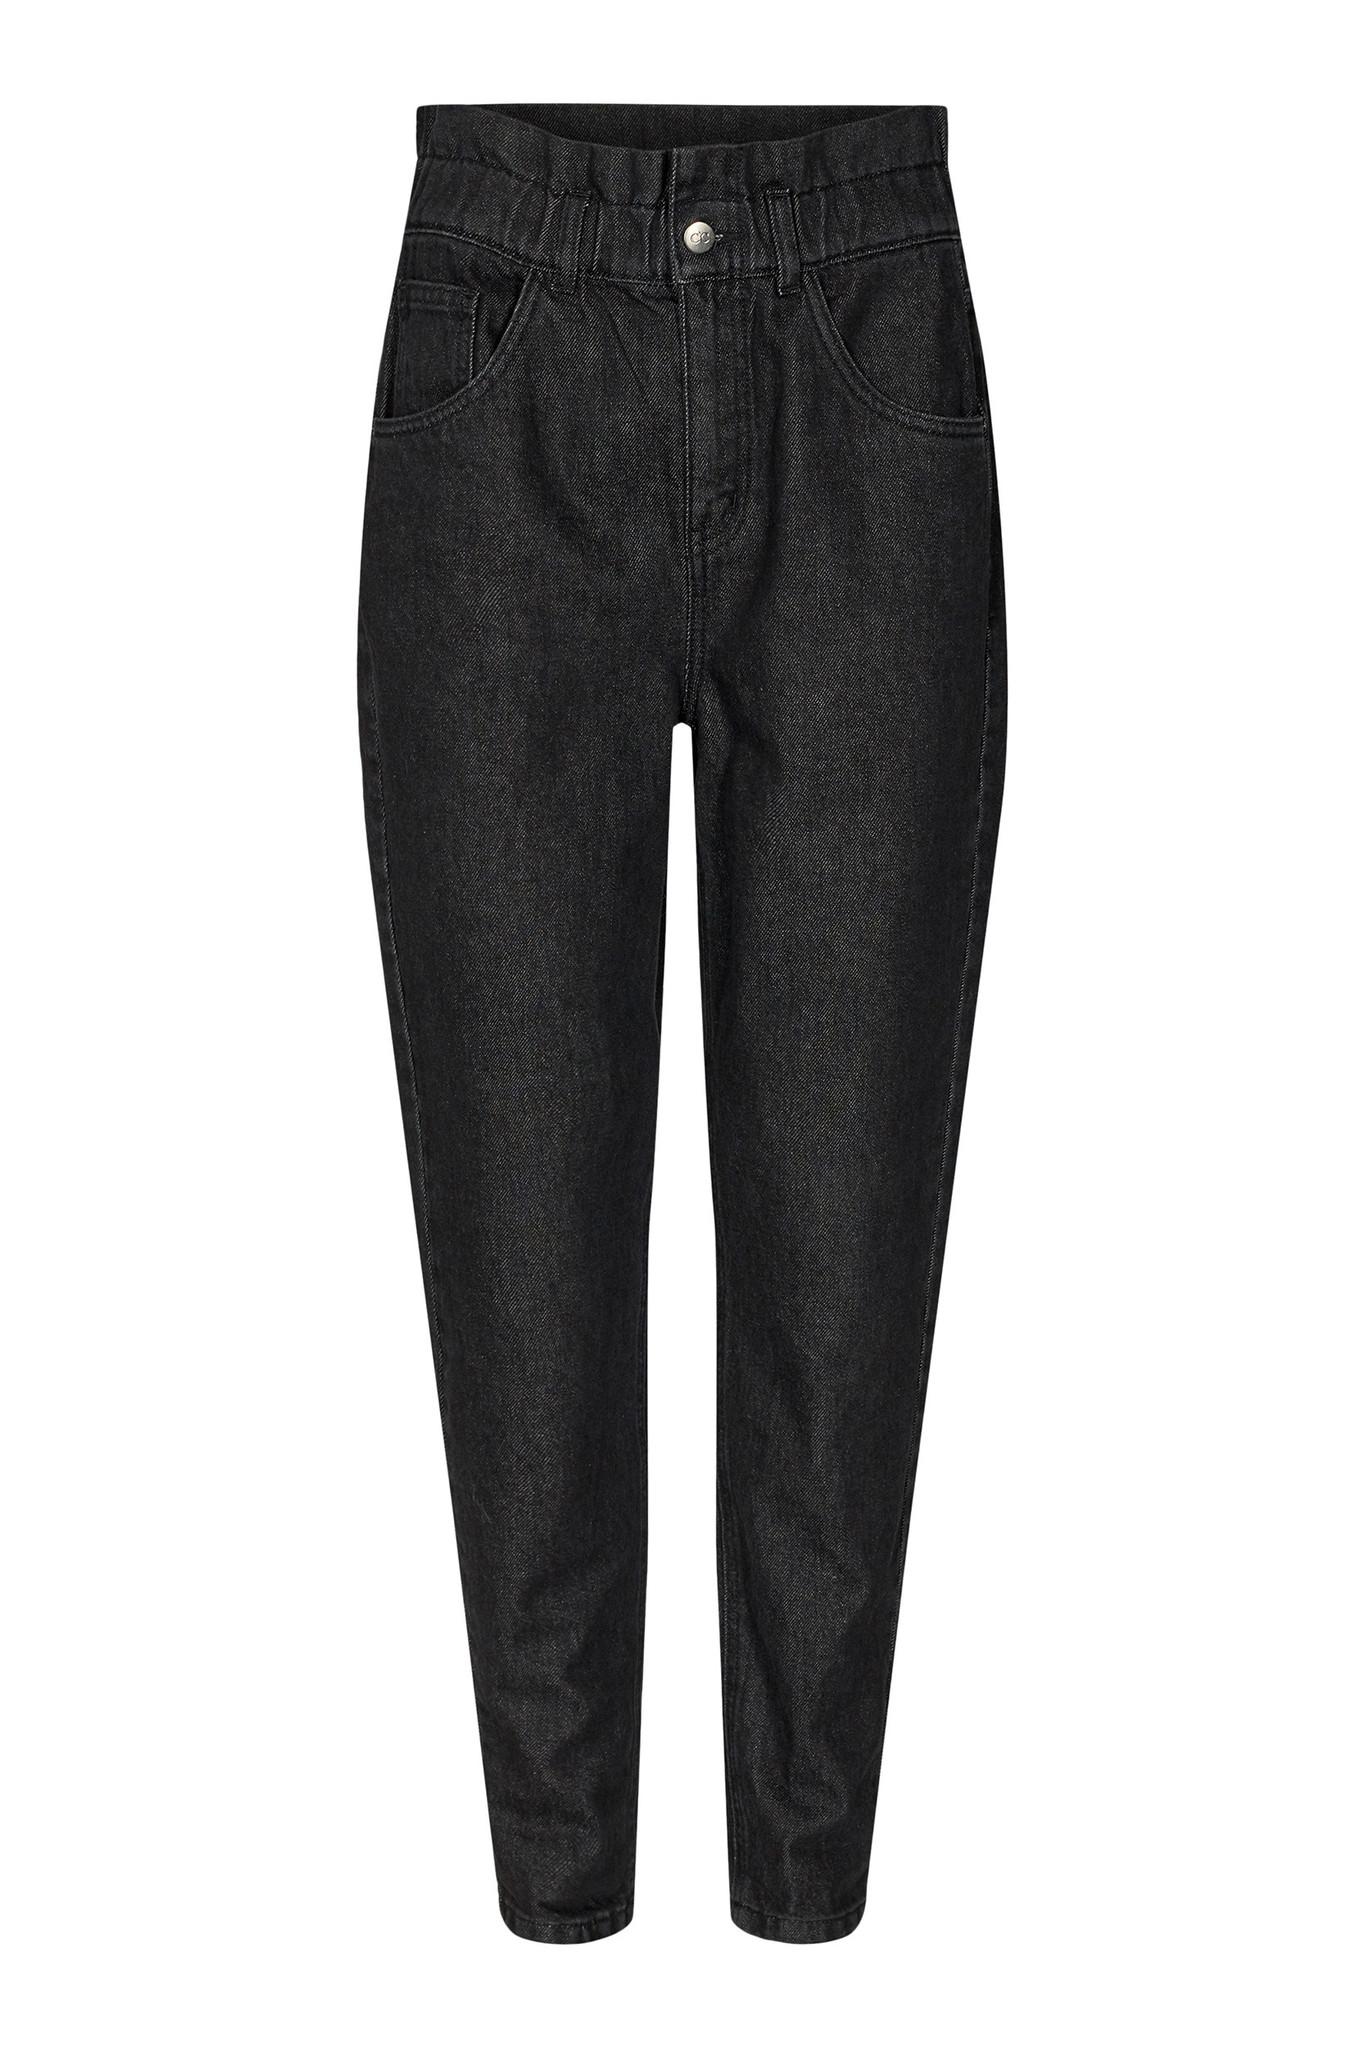 Zayn Jeans - Black-1